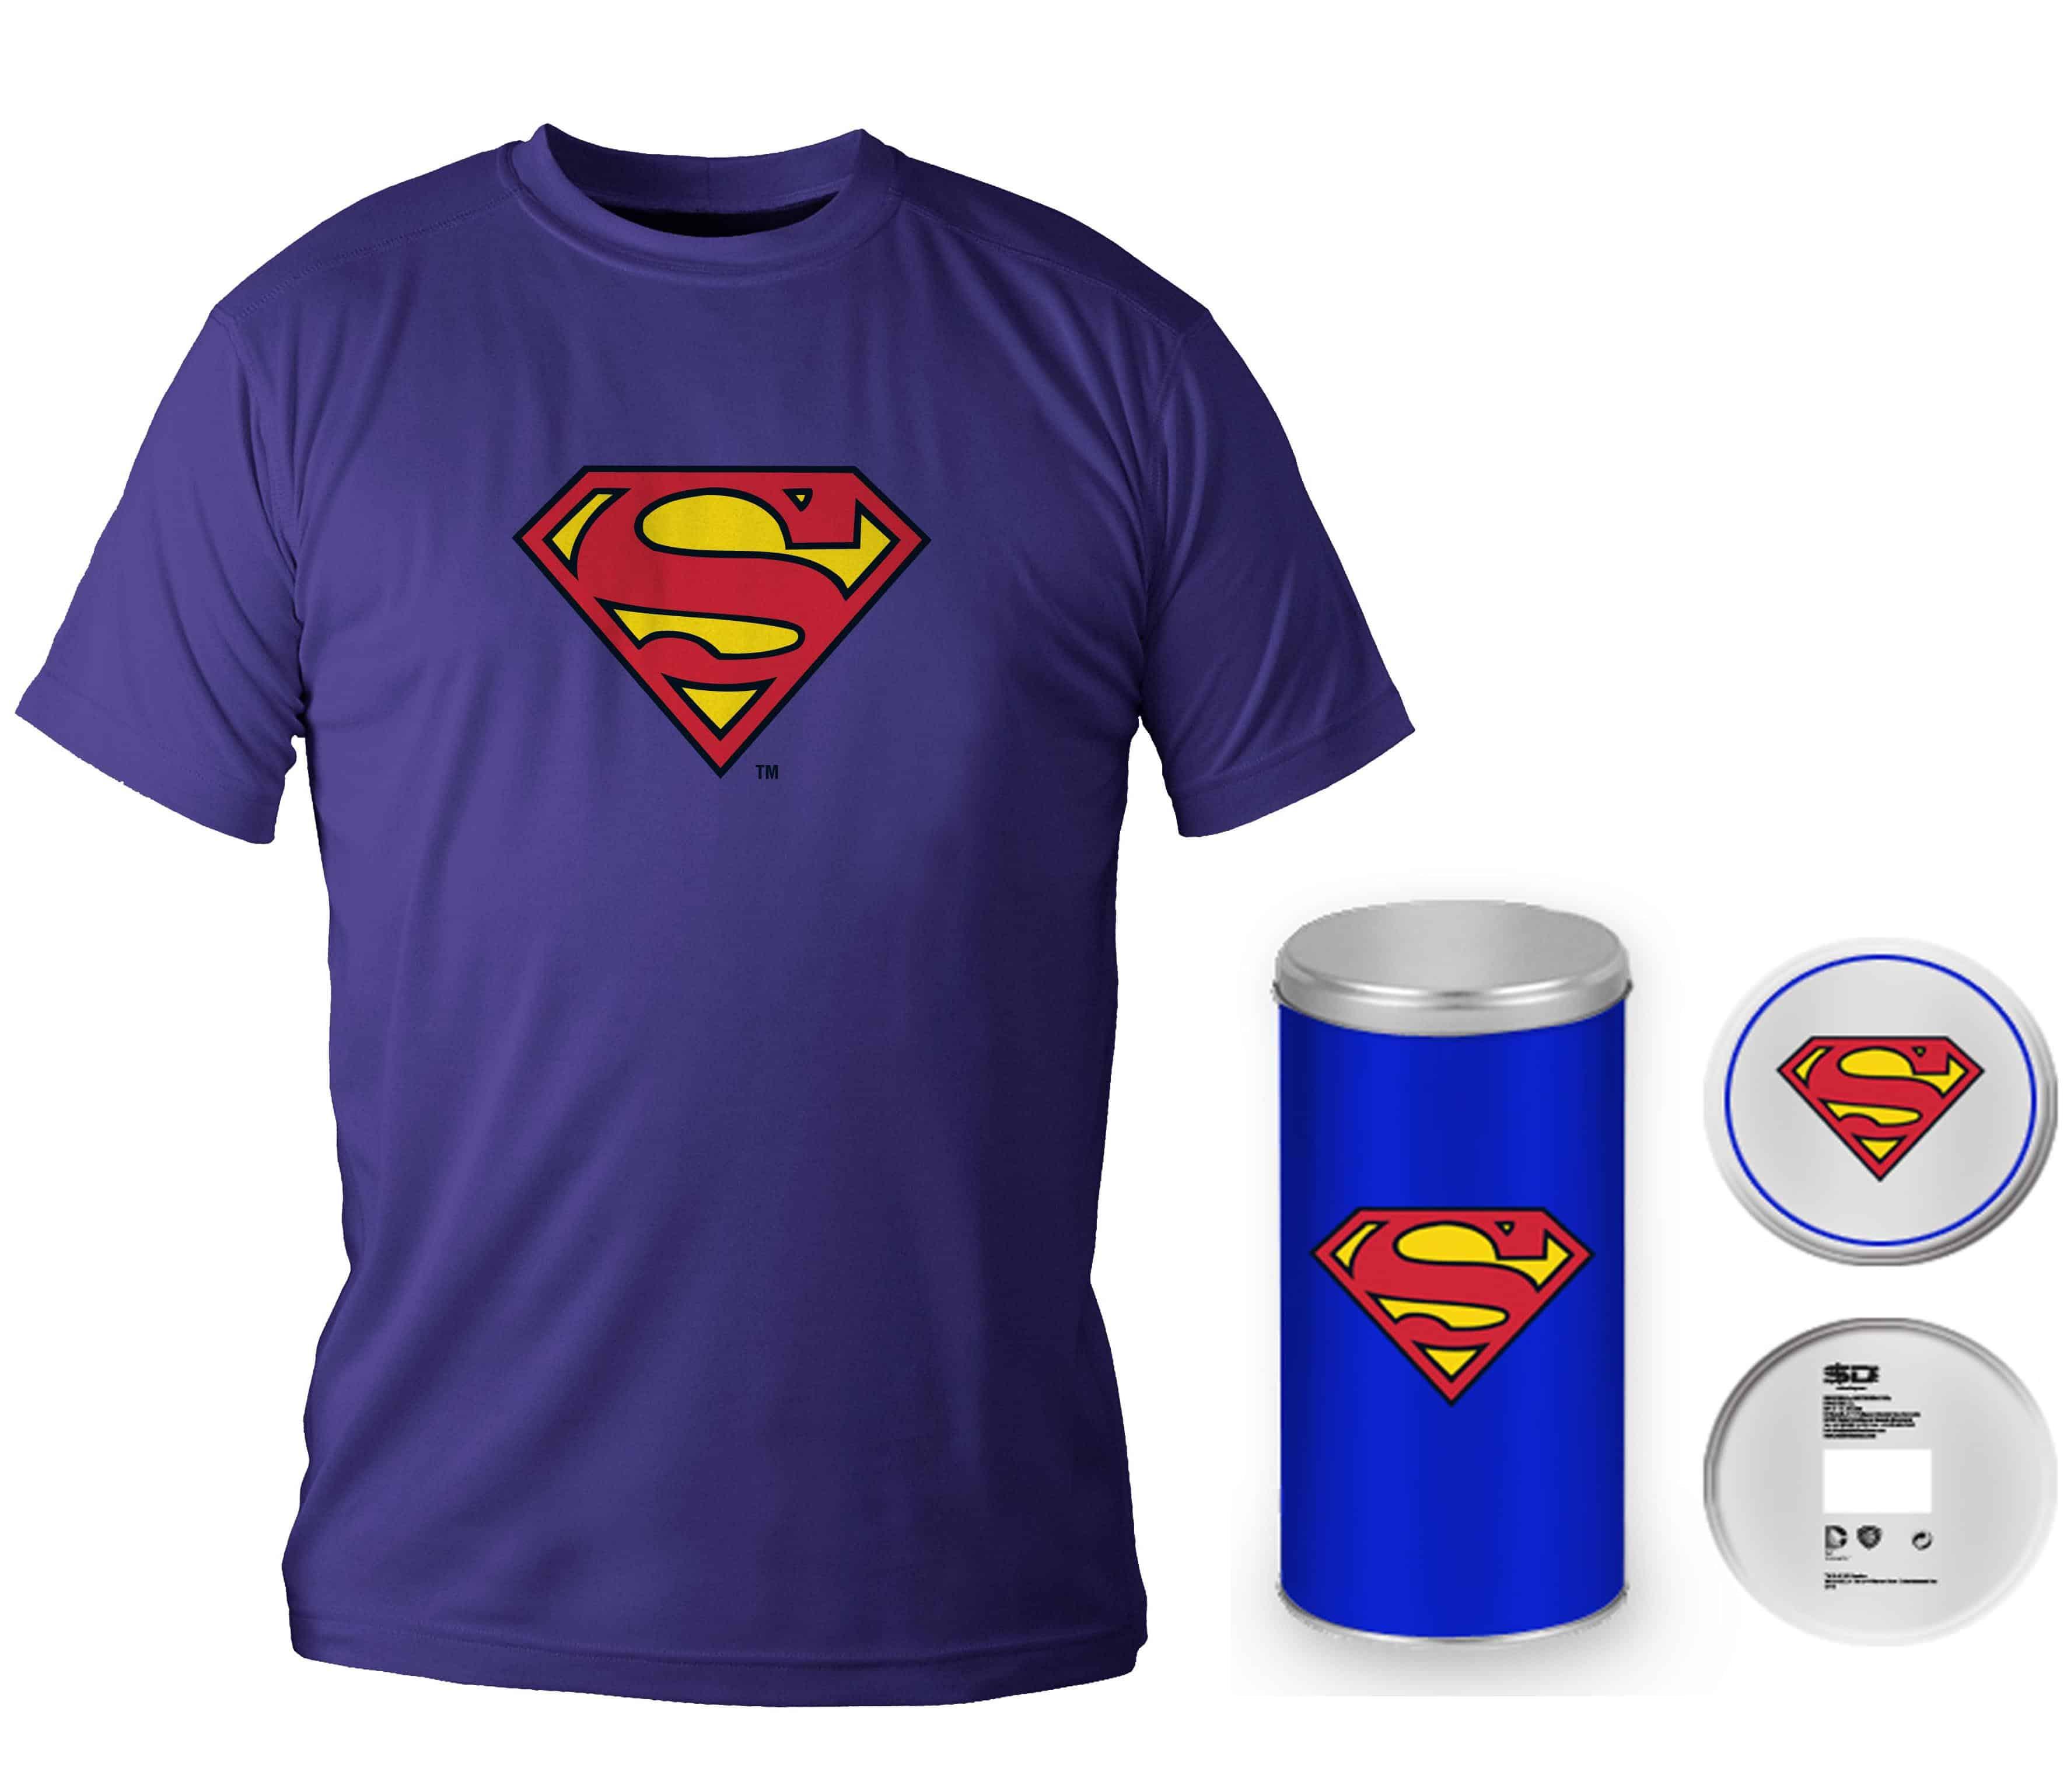 LOGO SUPERMAN CAMISETA AZUL CHICO T-XXL EDICION DELUXE DC COMICS